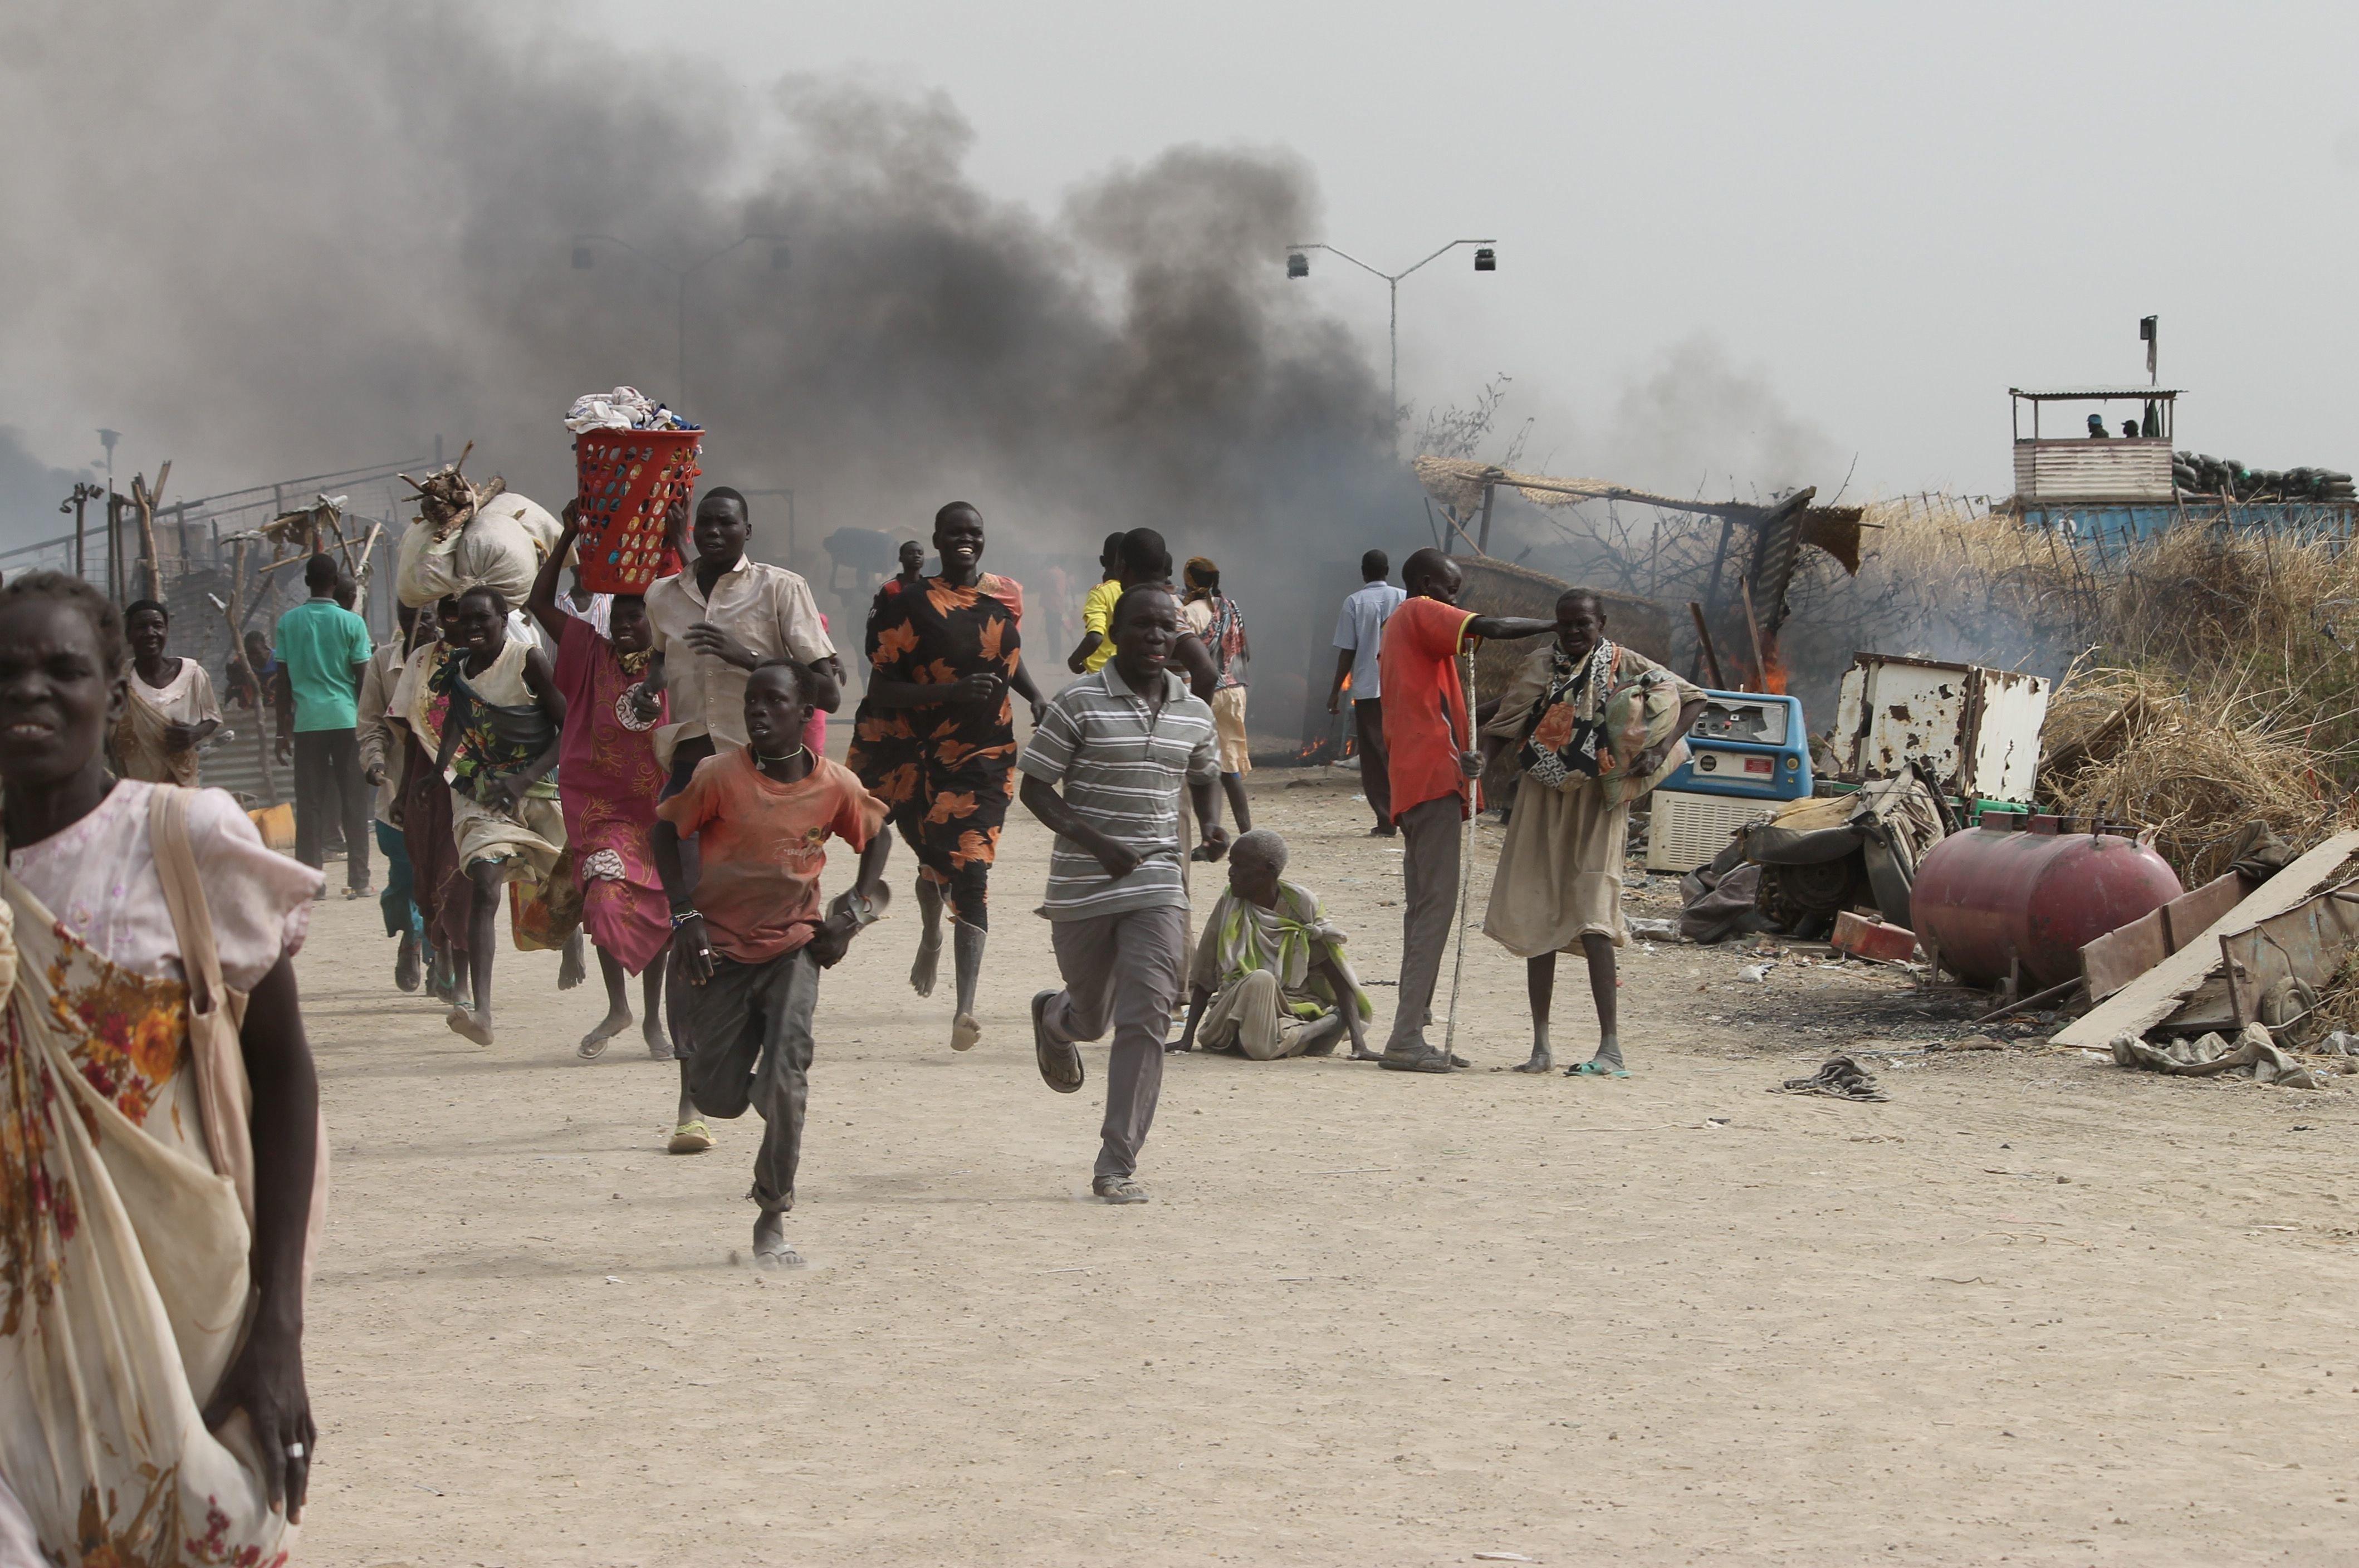 Gunmen opened fire on the UN base in Malakai where civilians had been sheltering.